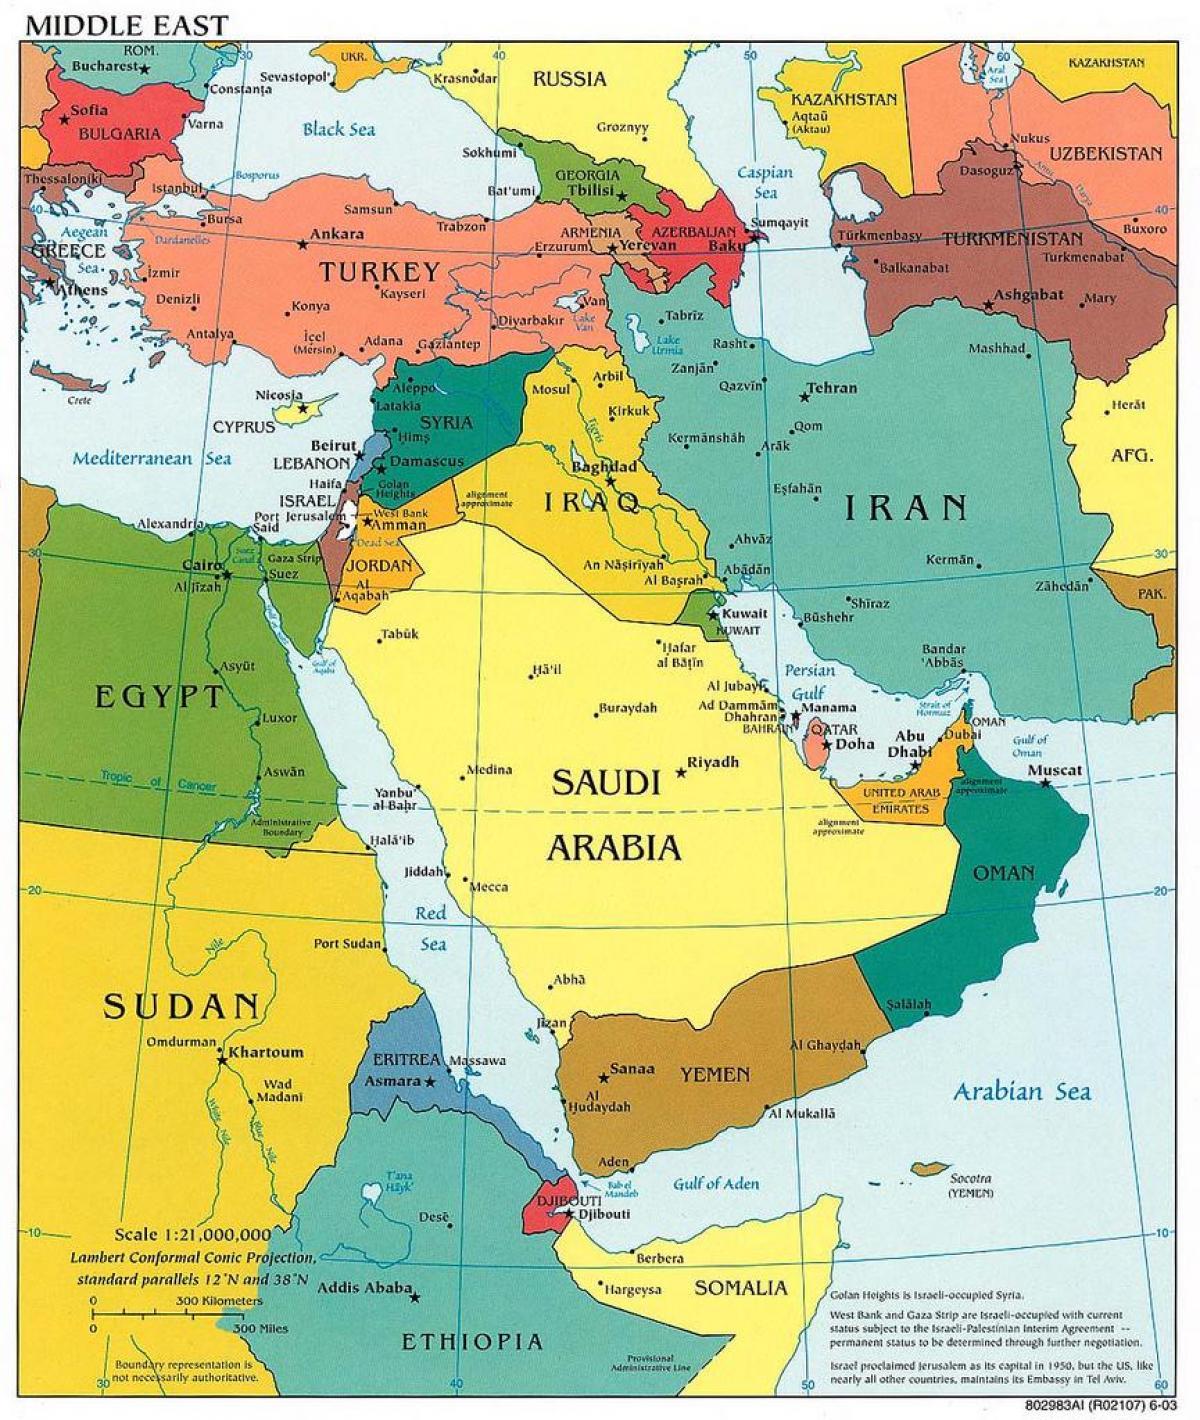 mellanöstern karta Jerusalem mellanöstern karta   Mellanöstern karta Jerusalem (Israel) mellanöstern karta